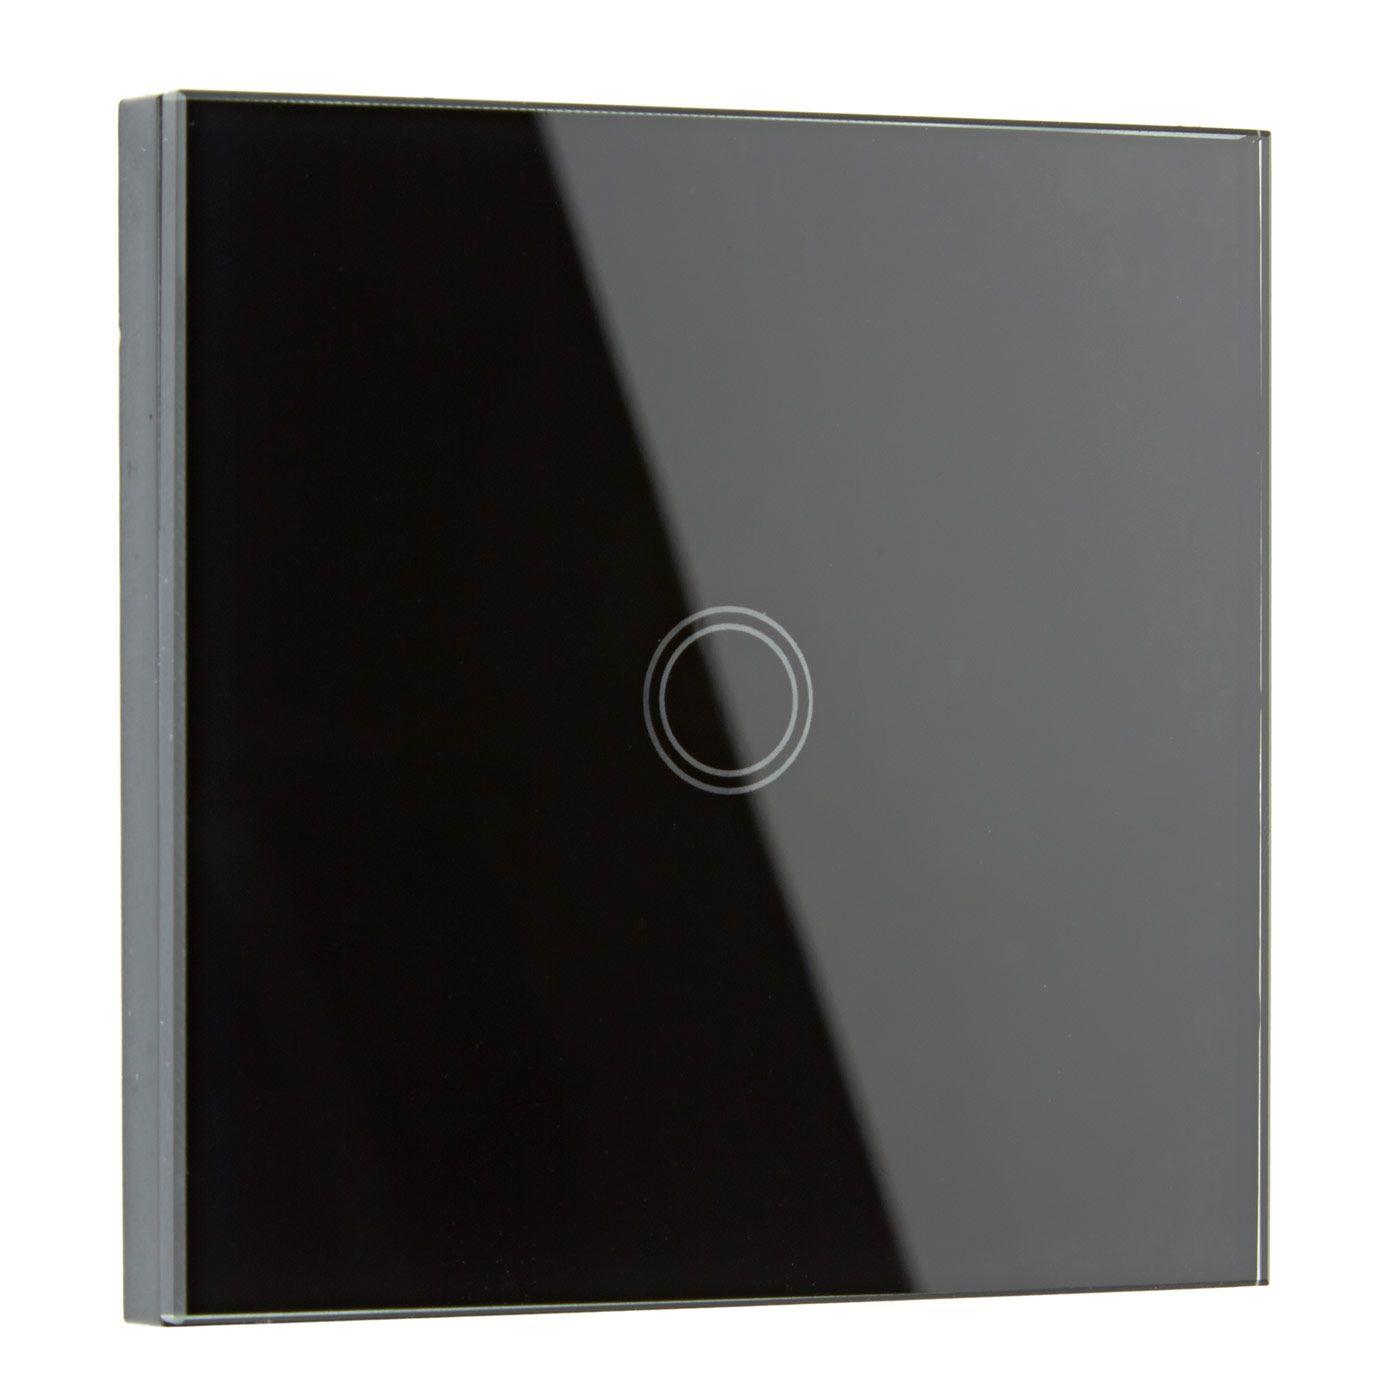 Biard Interrupteur Design Tactile Verre Noir